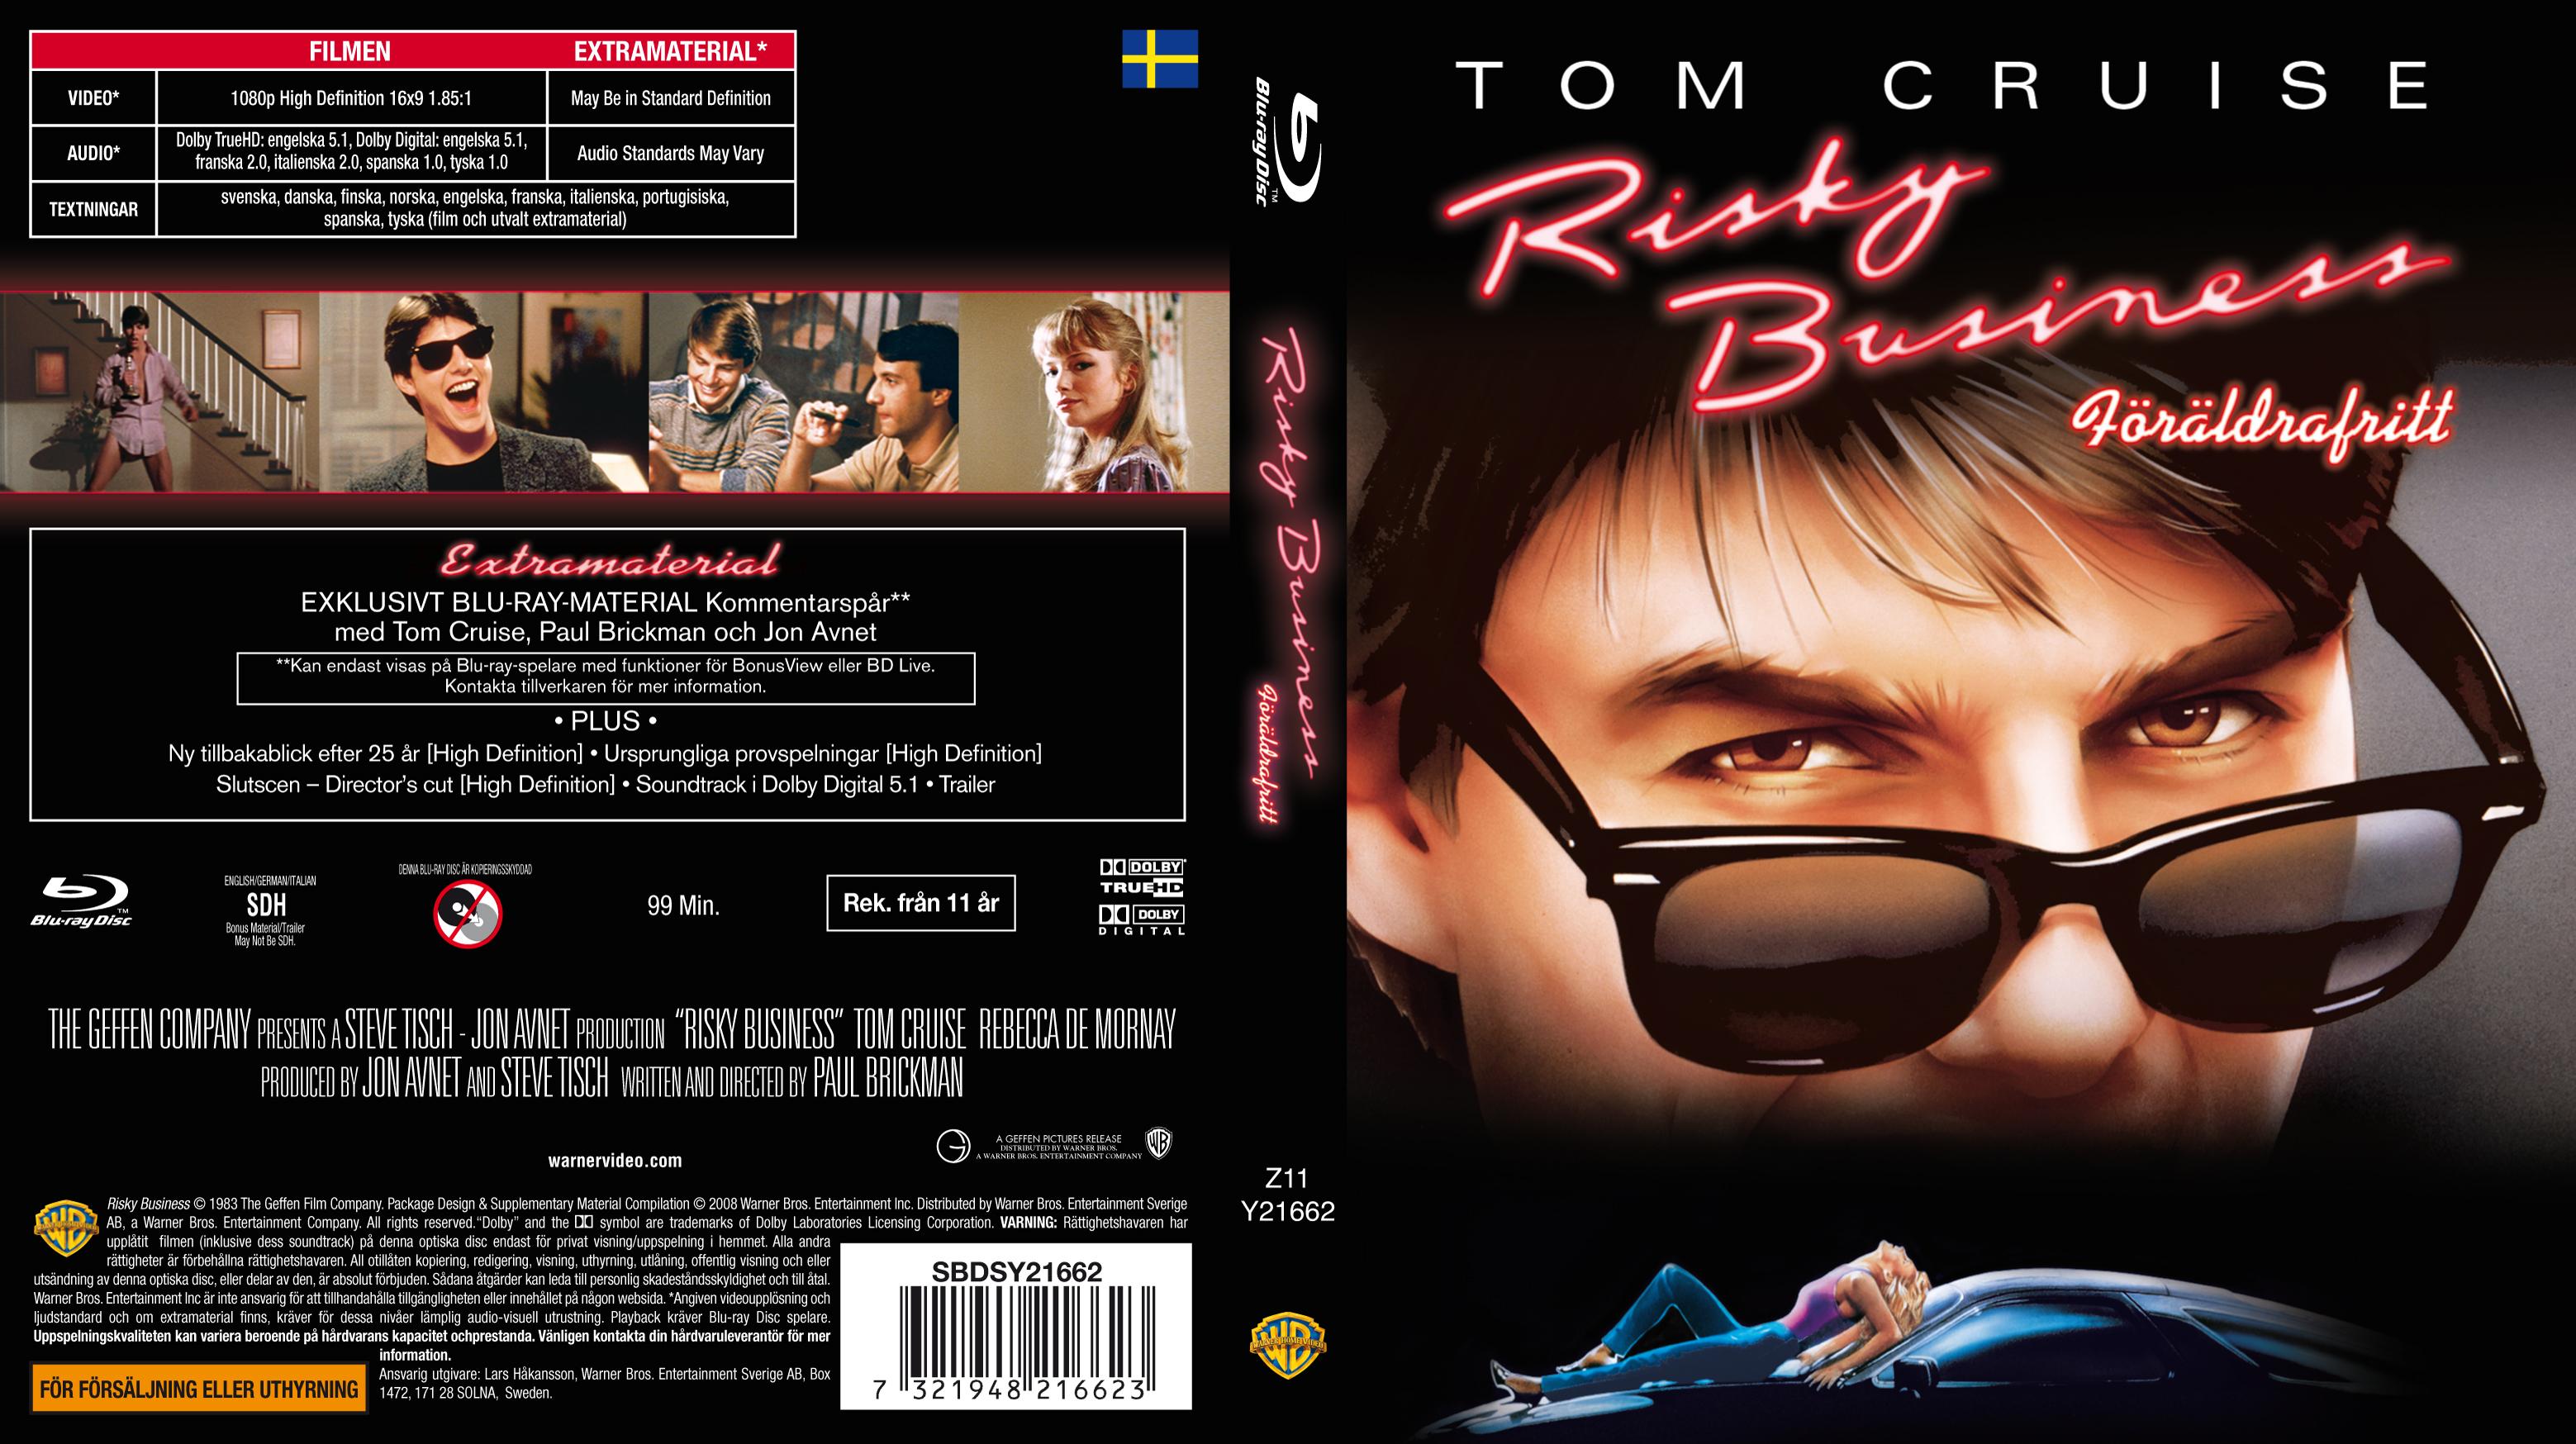 Risky Business (1983) x Extras x265 10 Bits 1080p